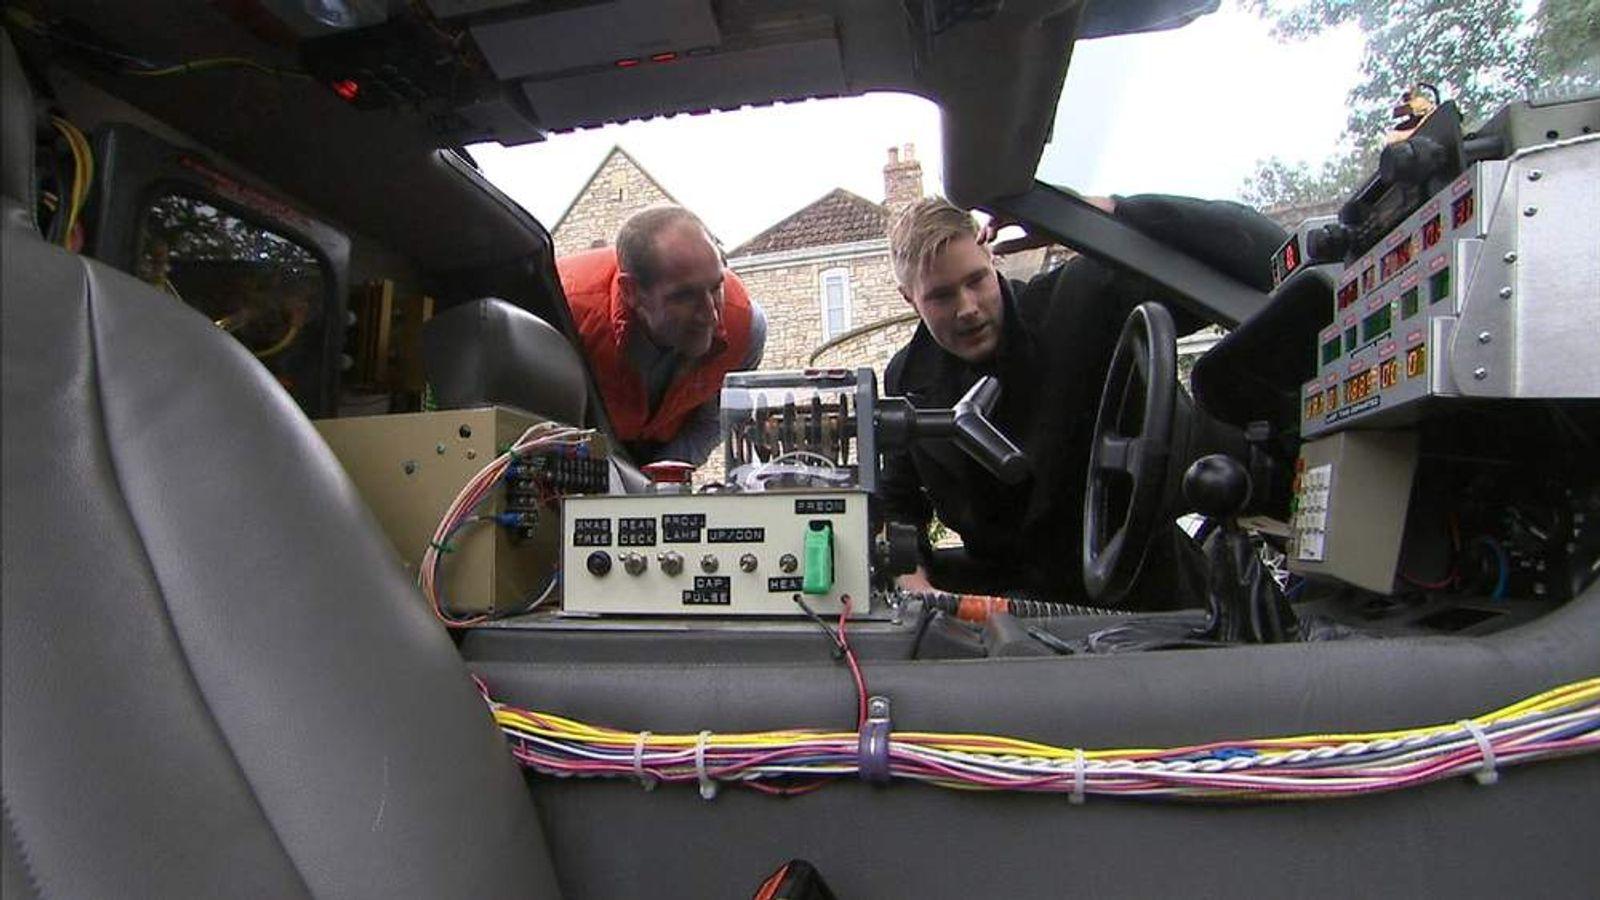 Inside a DeLorean car